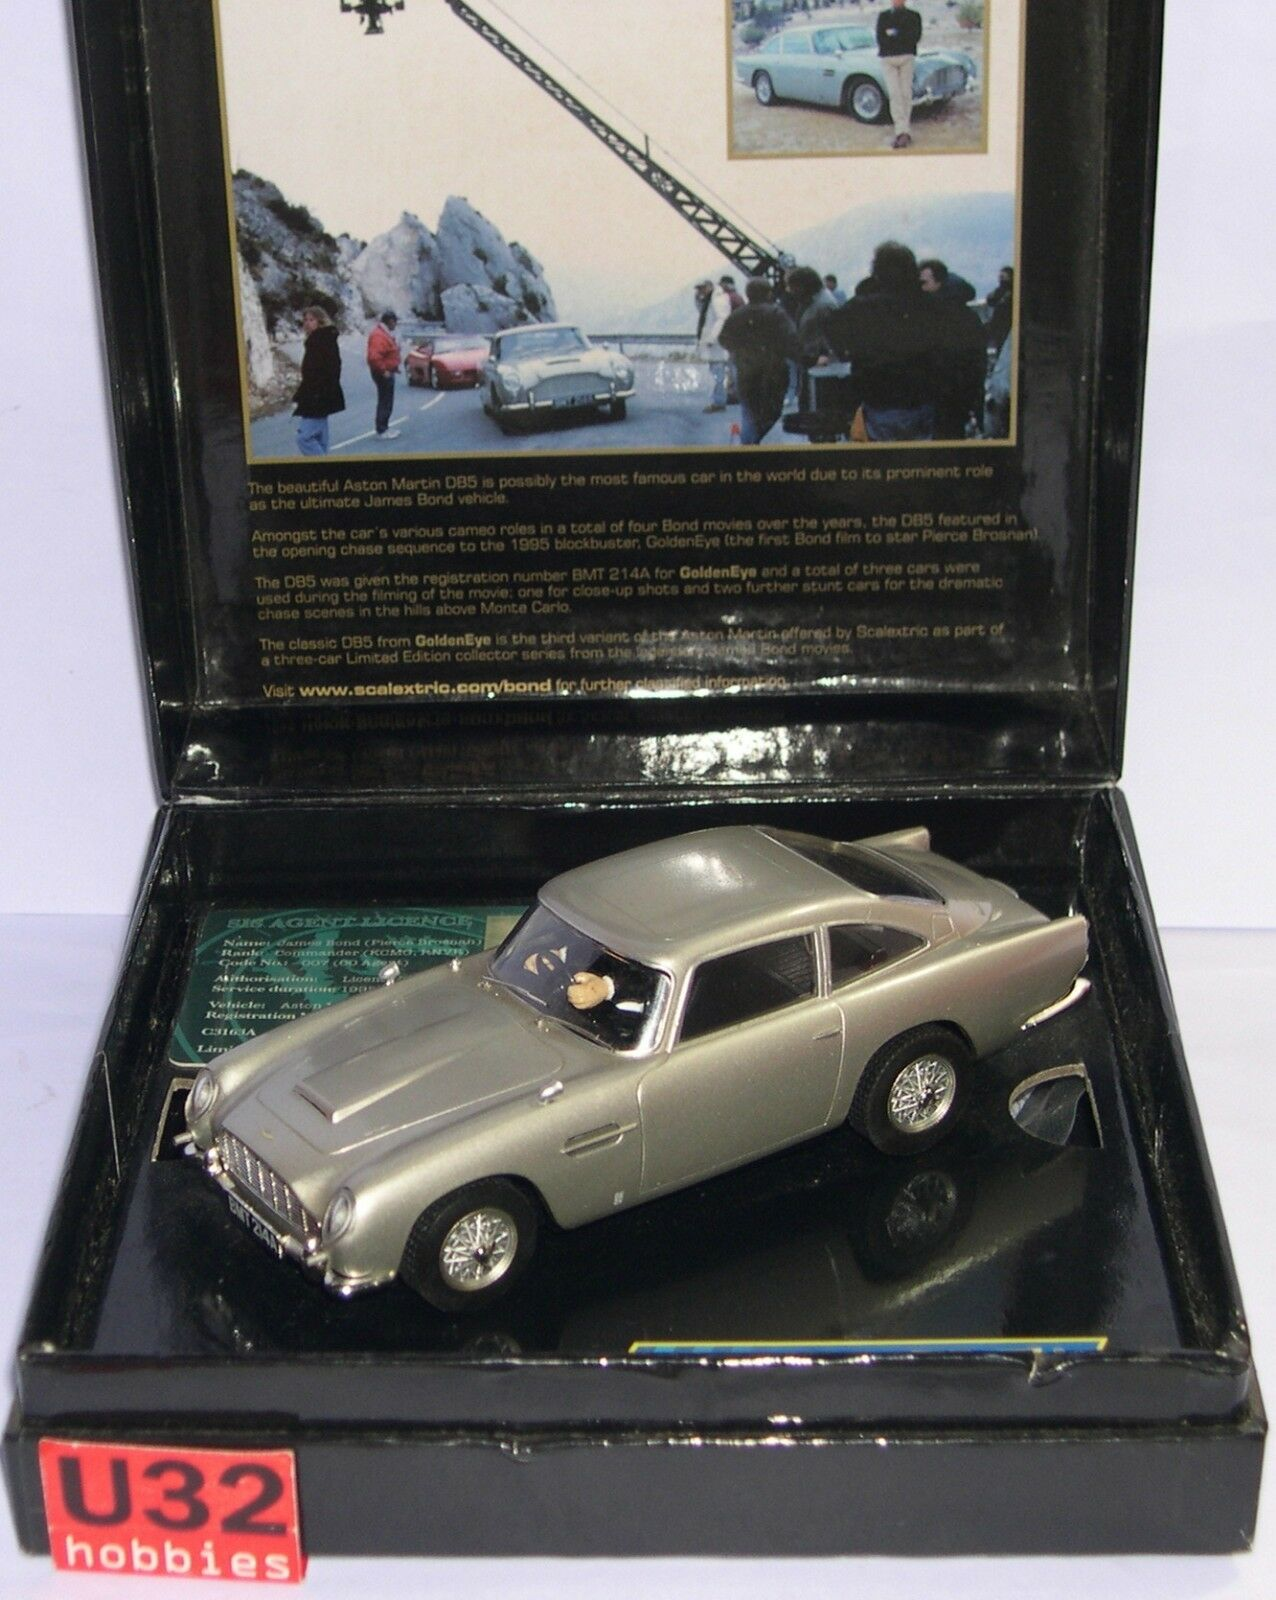 Bestellung H3163a Aston Martin Db5 James Bond Goldeneye 007 Scalextric UK MB